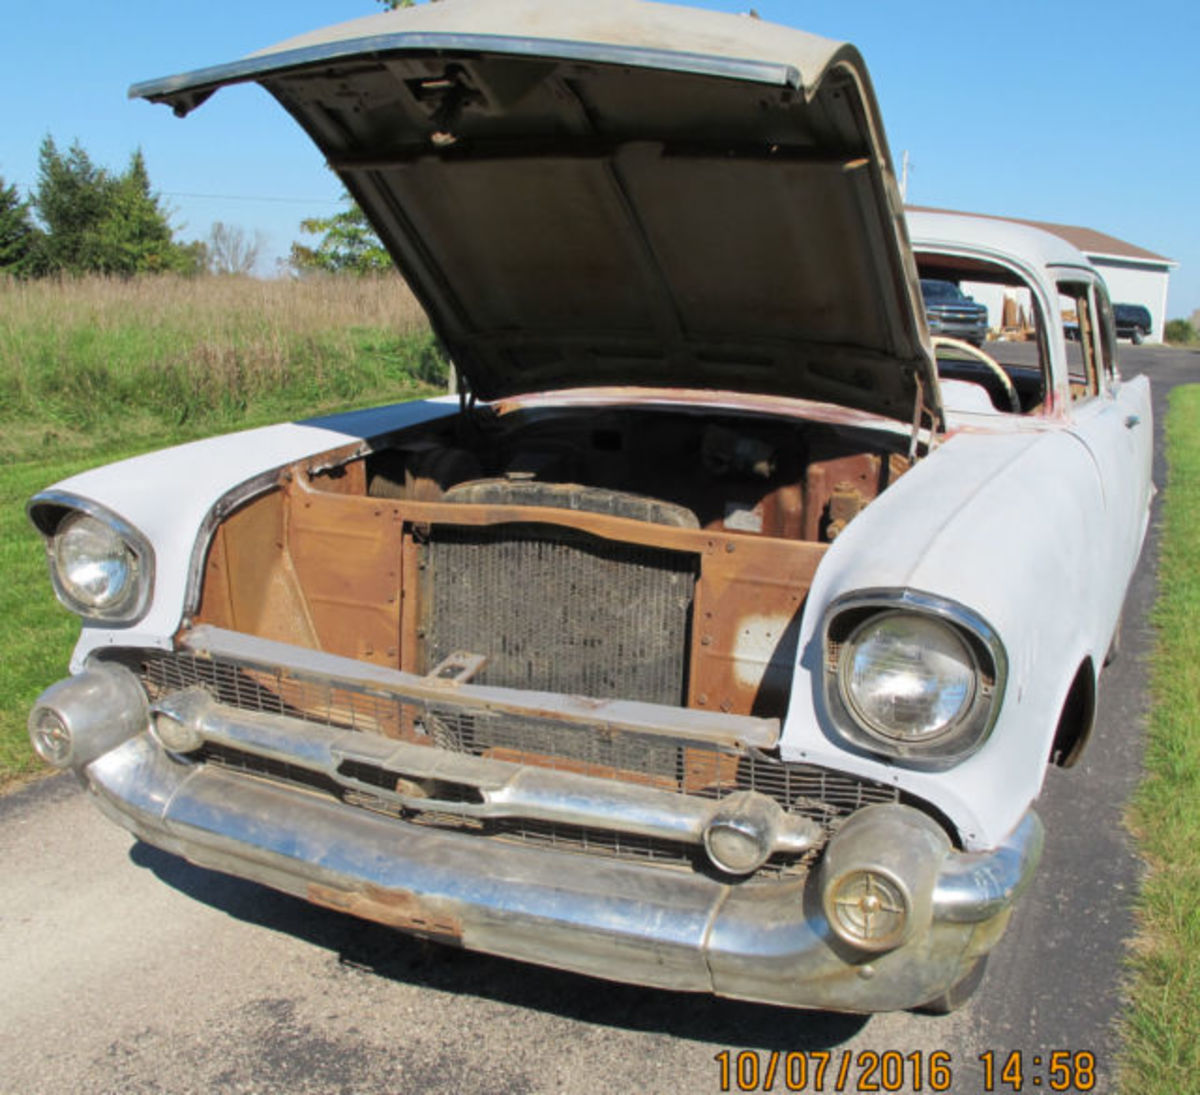 A rusty 1957 Chevrolet.